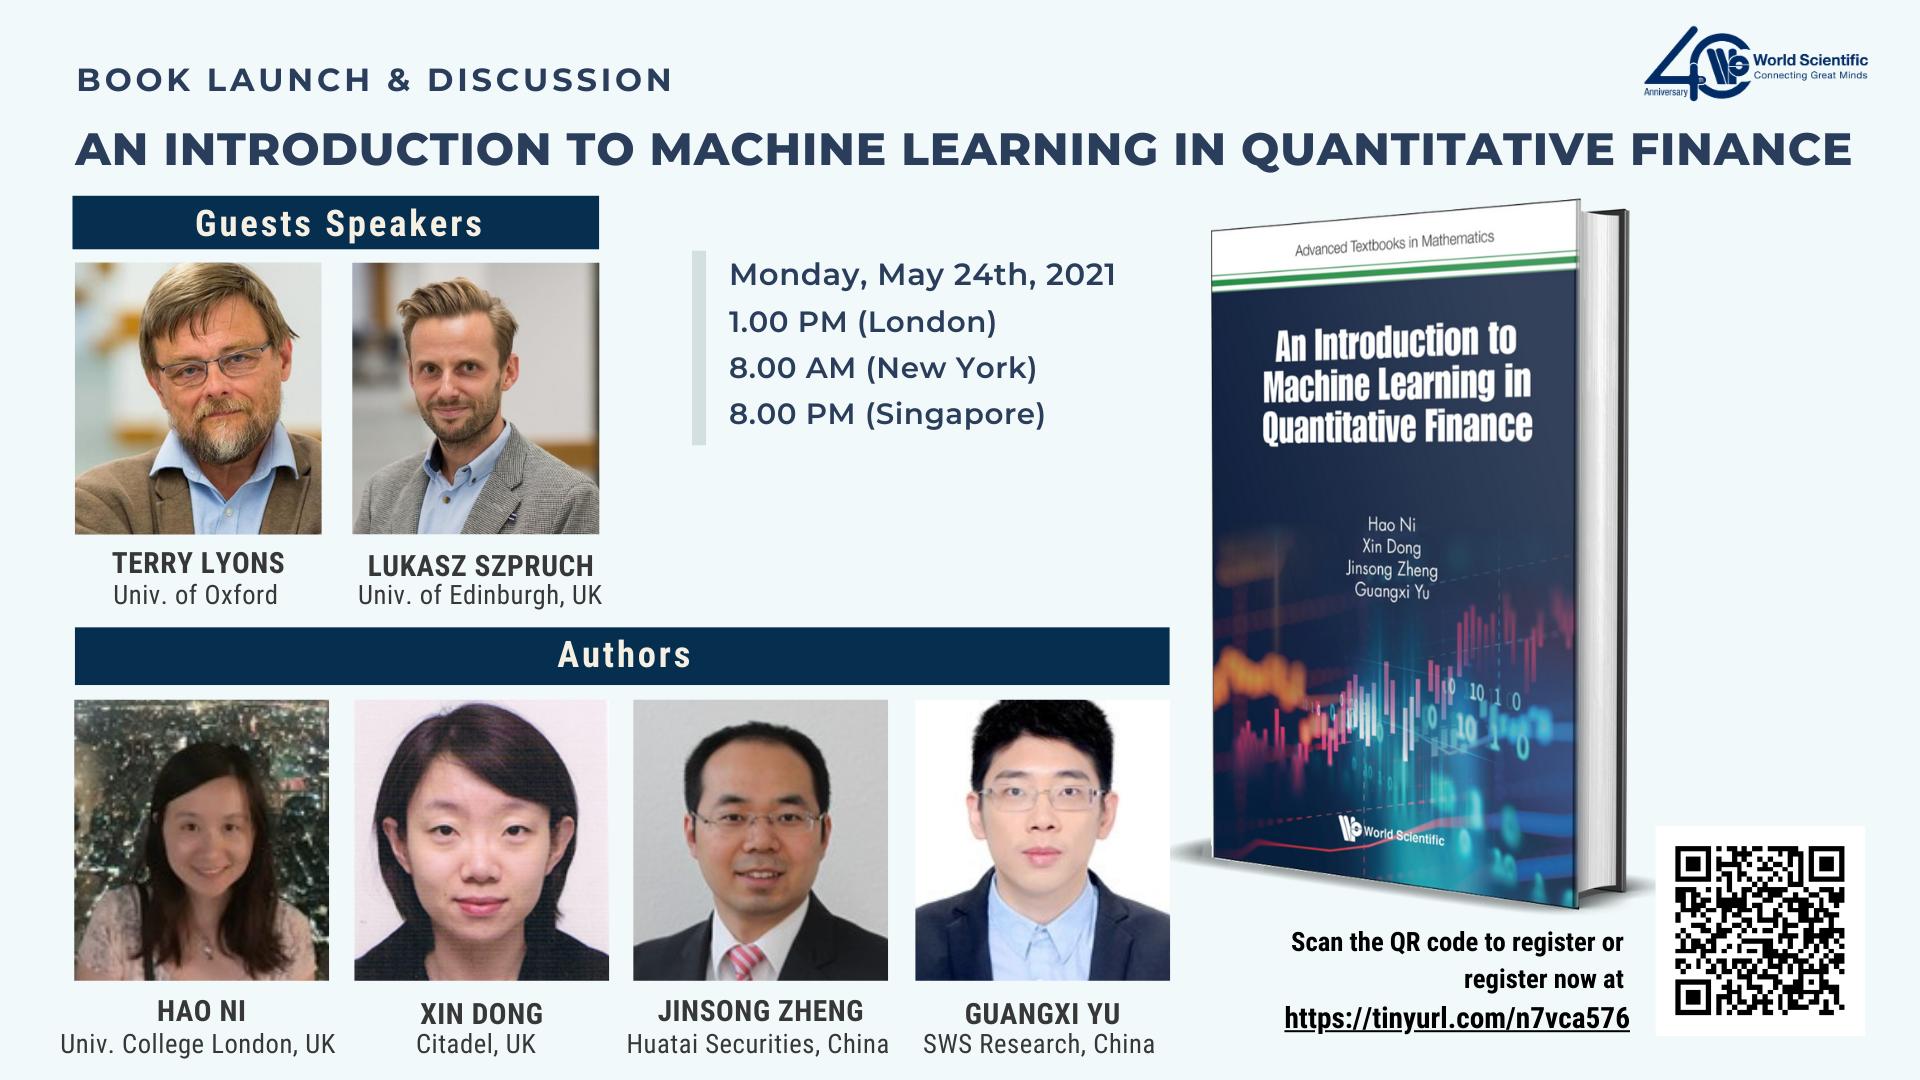 webinar q0275 machine learning in quantitative finance launchtalk fbpost 1920x1080 v2